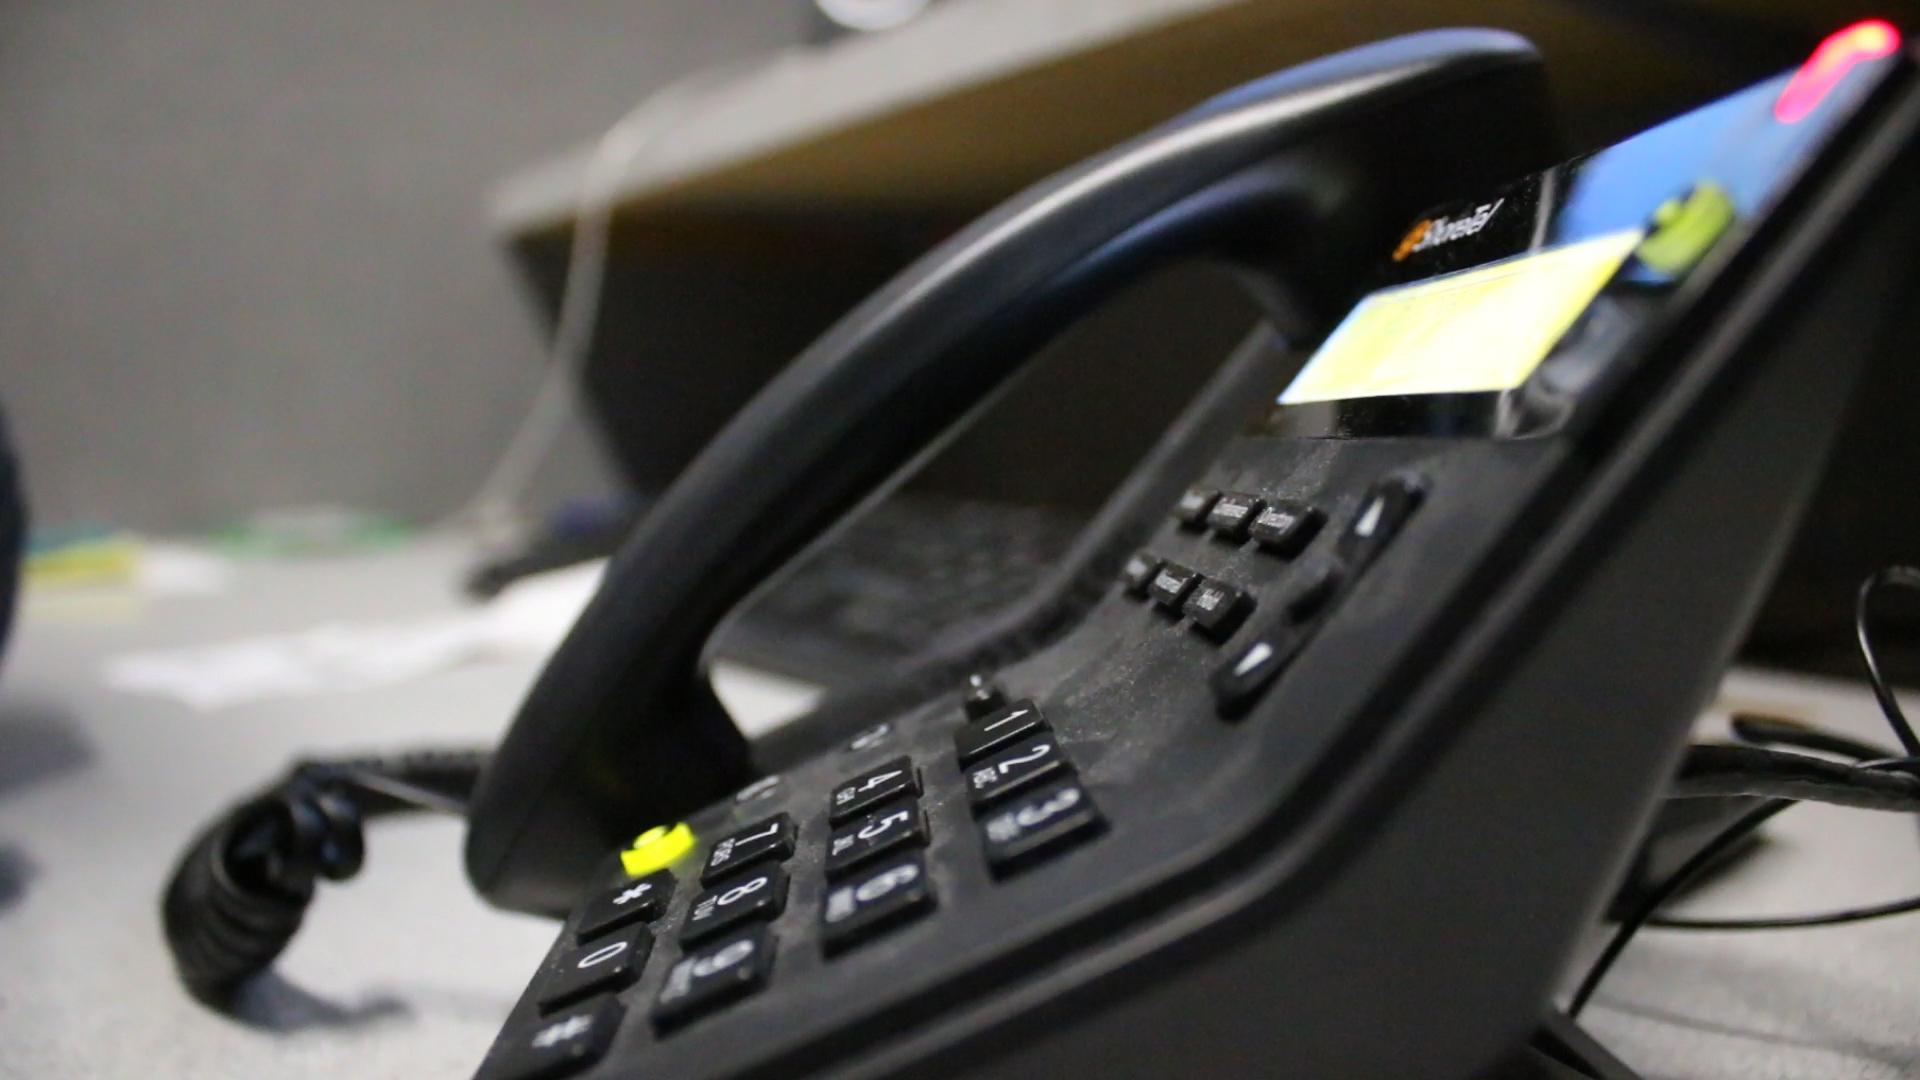 phone scam_1511127122874.jpg